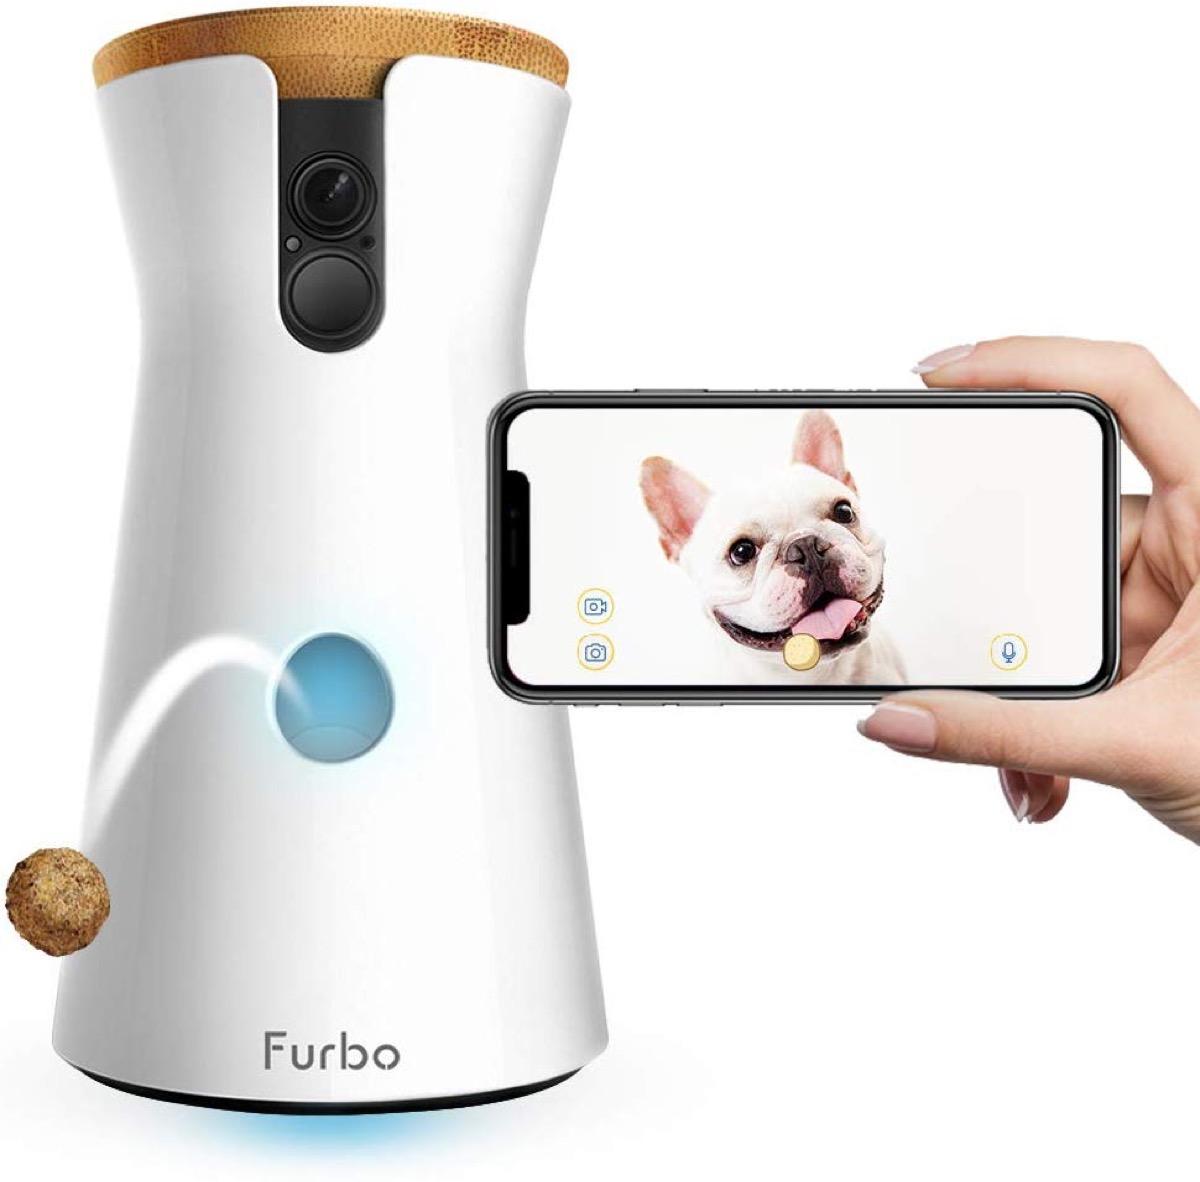 Dog camera and phone with dog image